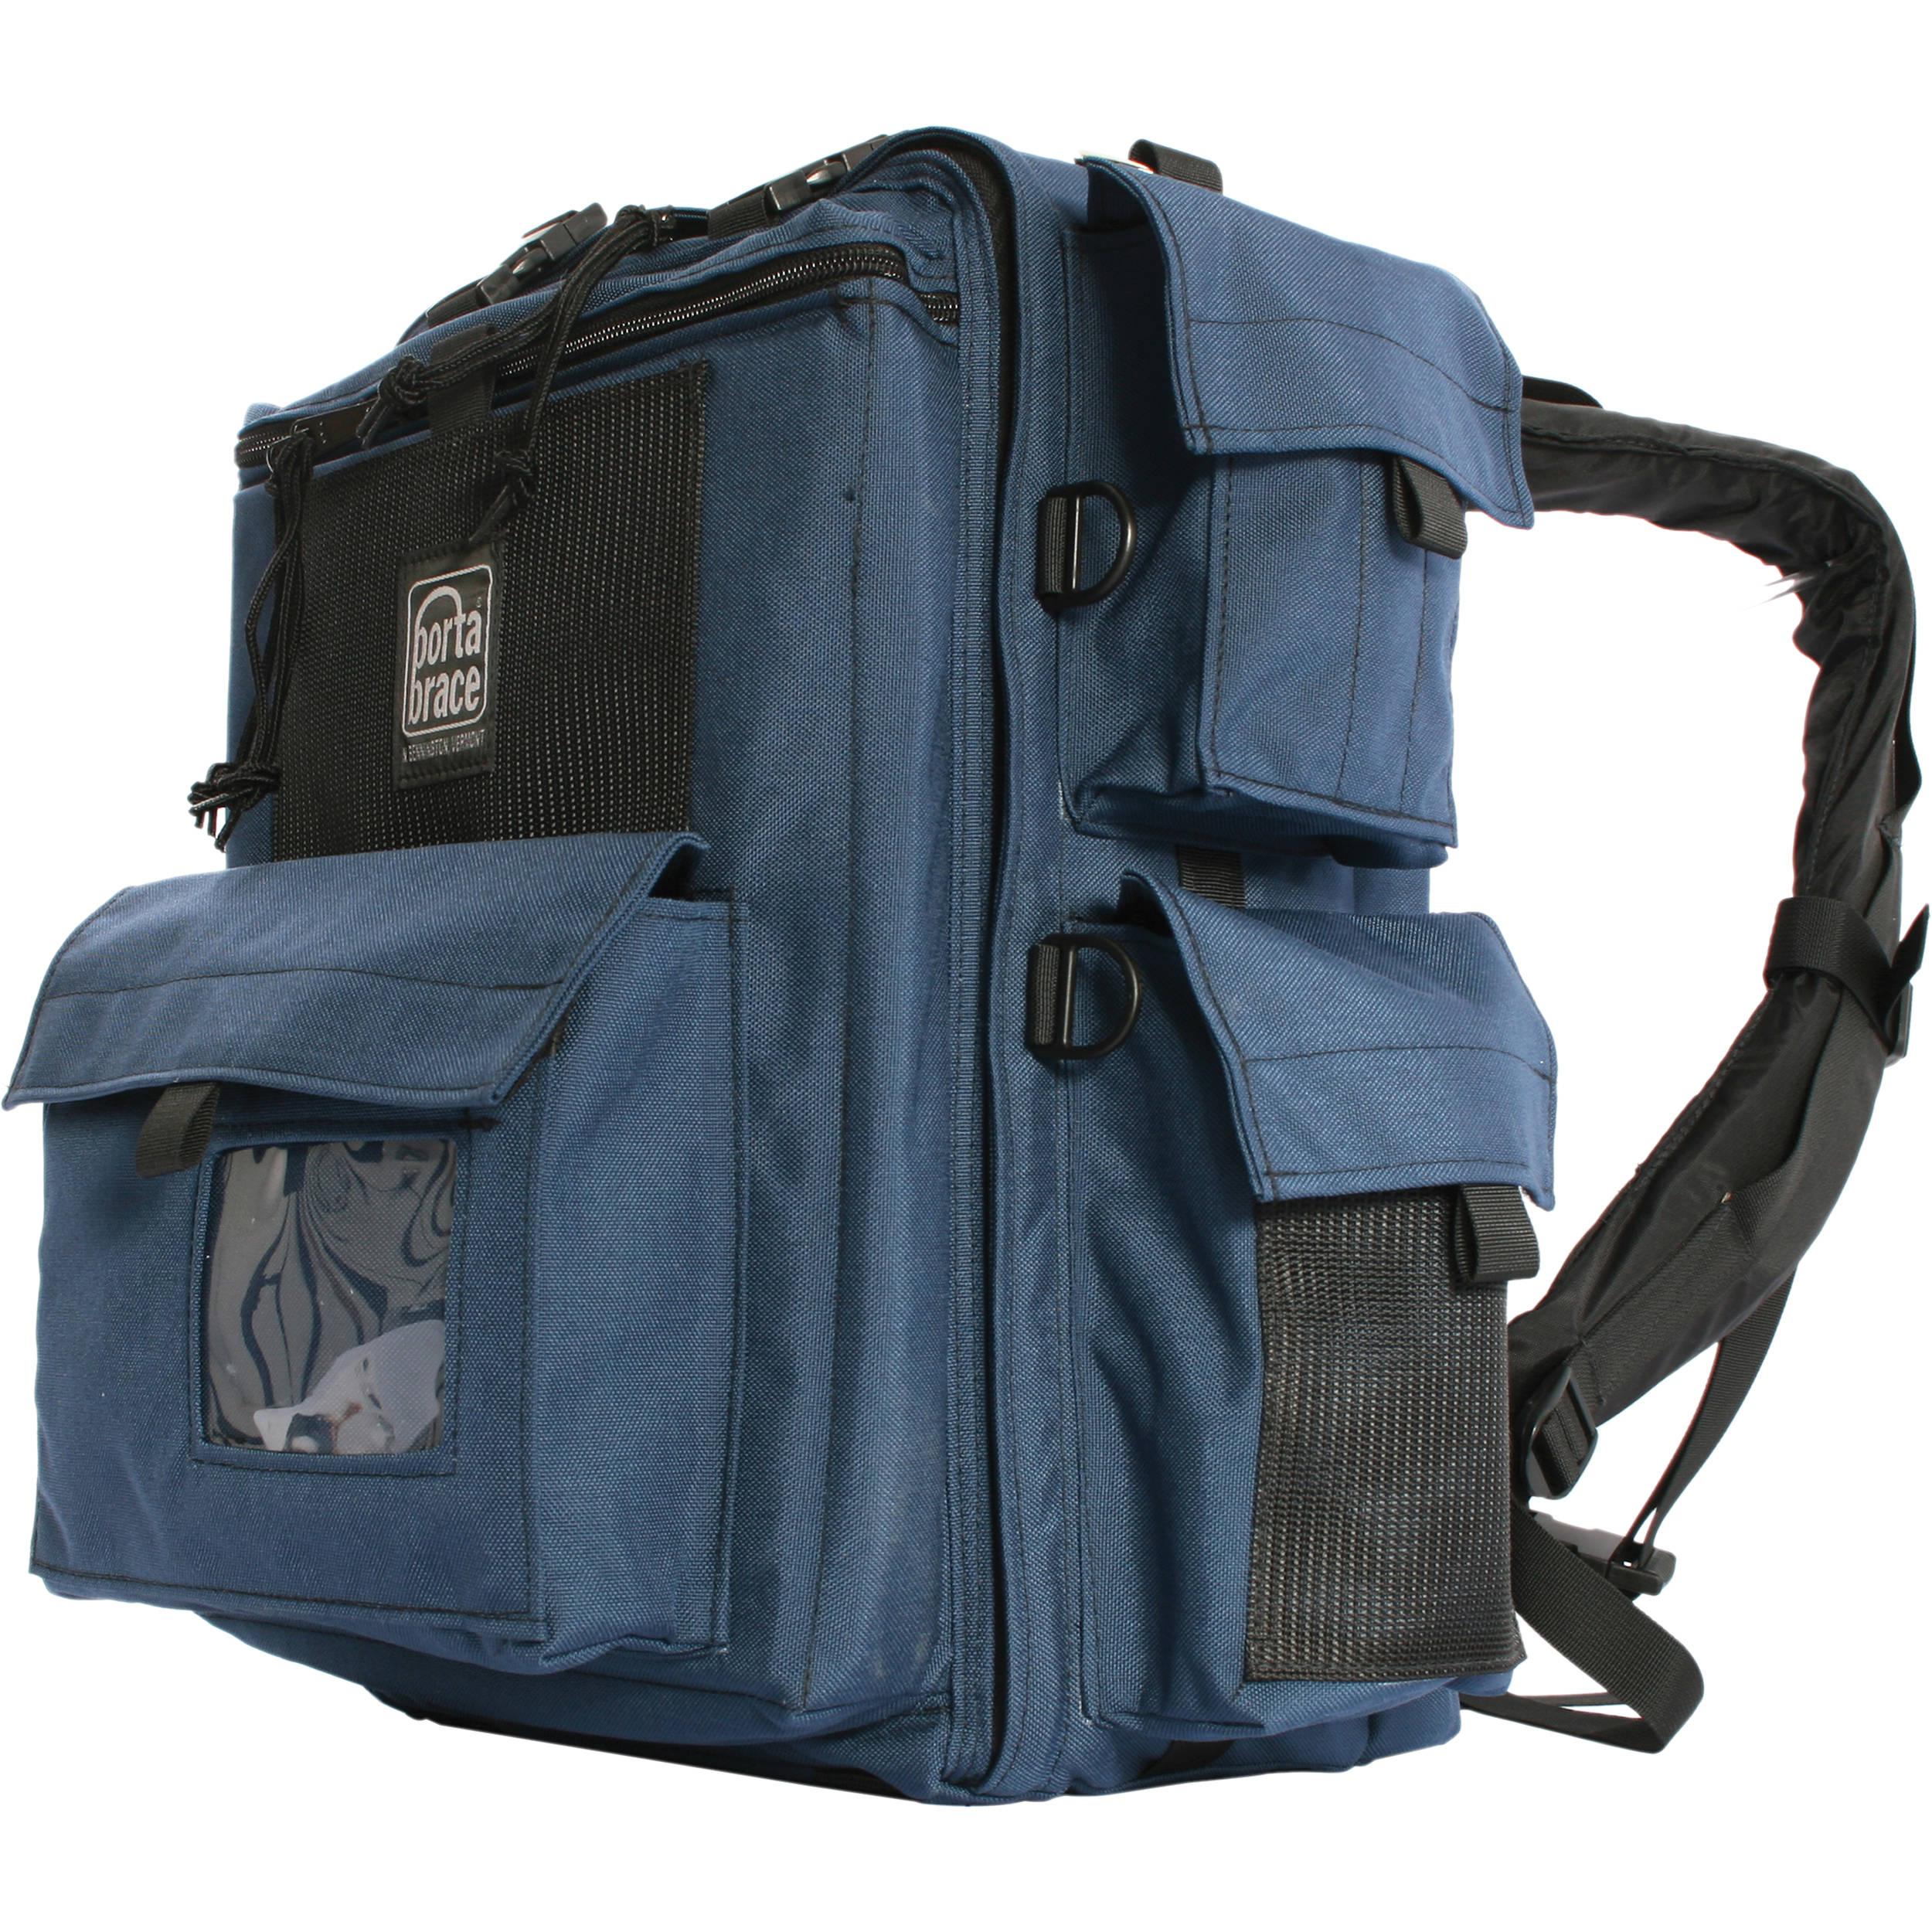 Porta Brace BK-1NQS-M4 Backpack (Blue) with Quick Slick rain cover